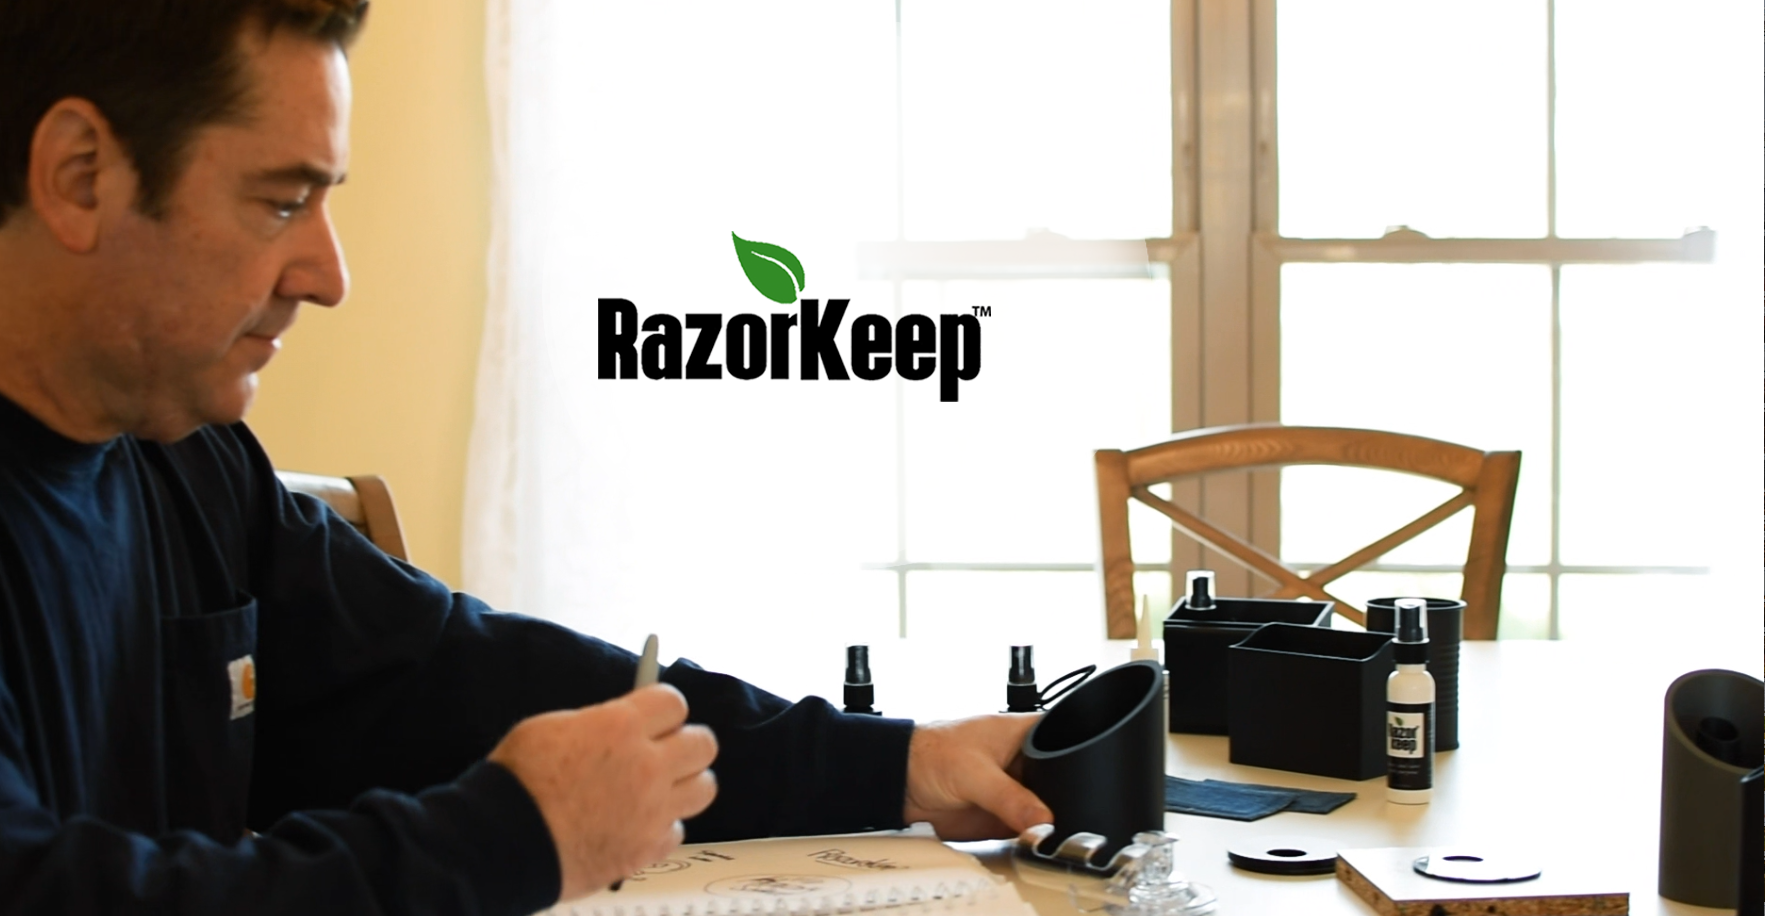 RazorKeep – World's Best Razor Maintenance System-GadgetAny